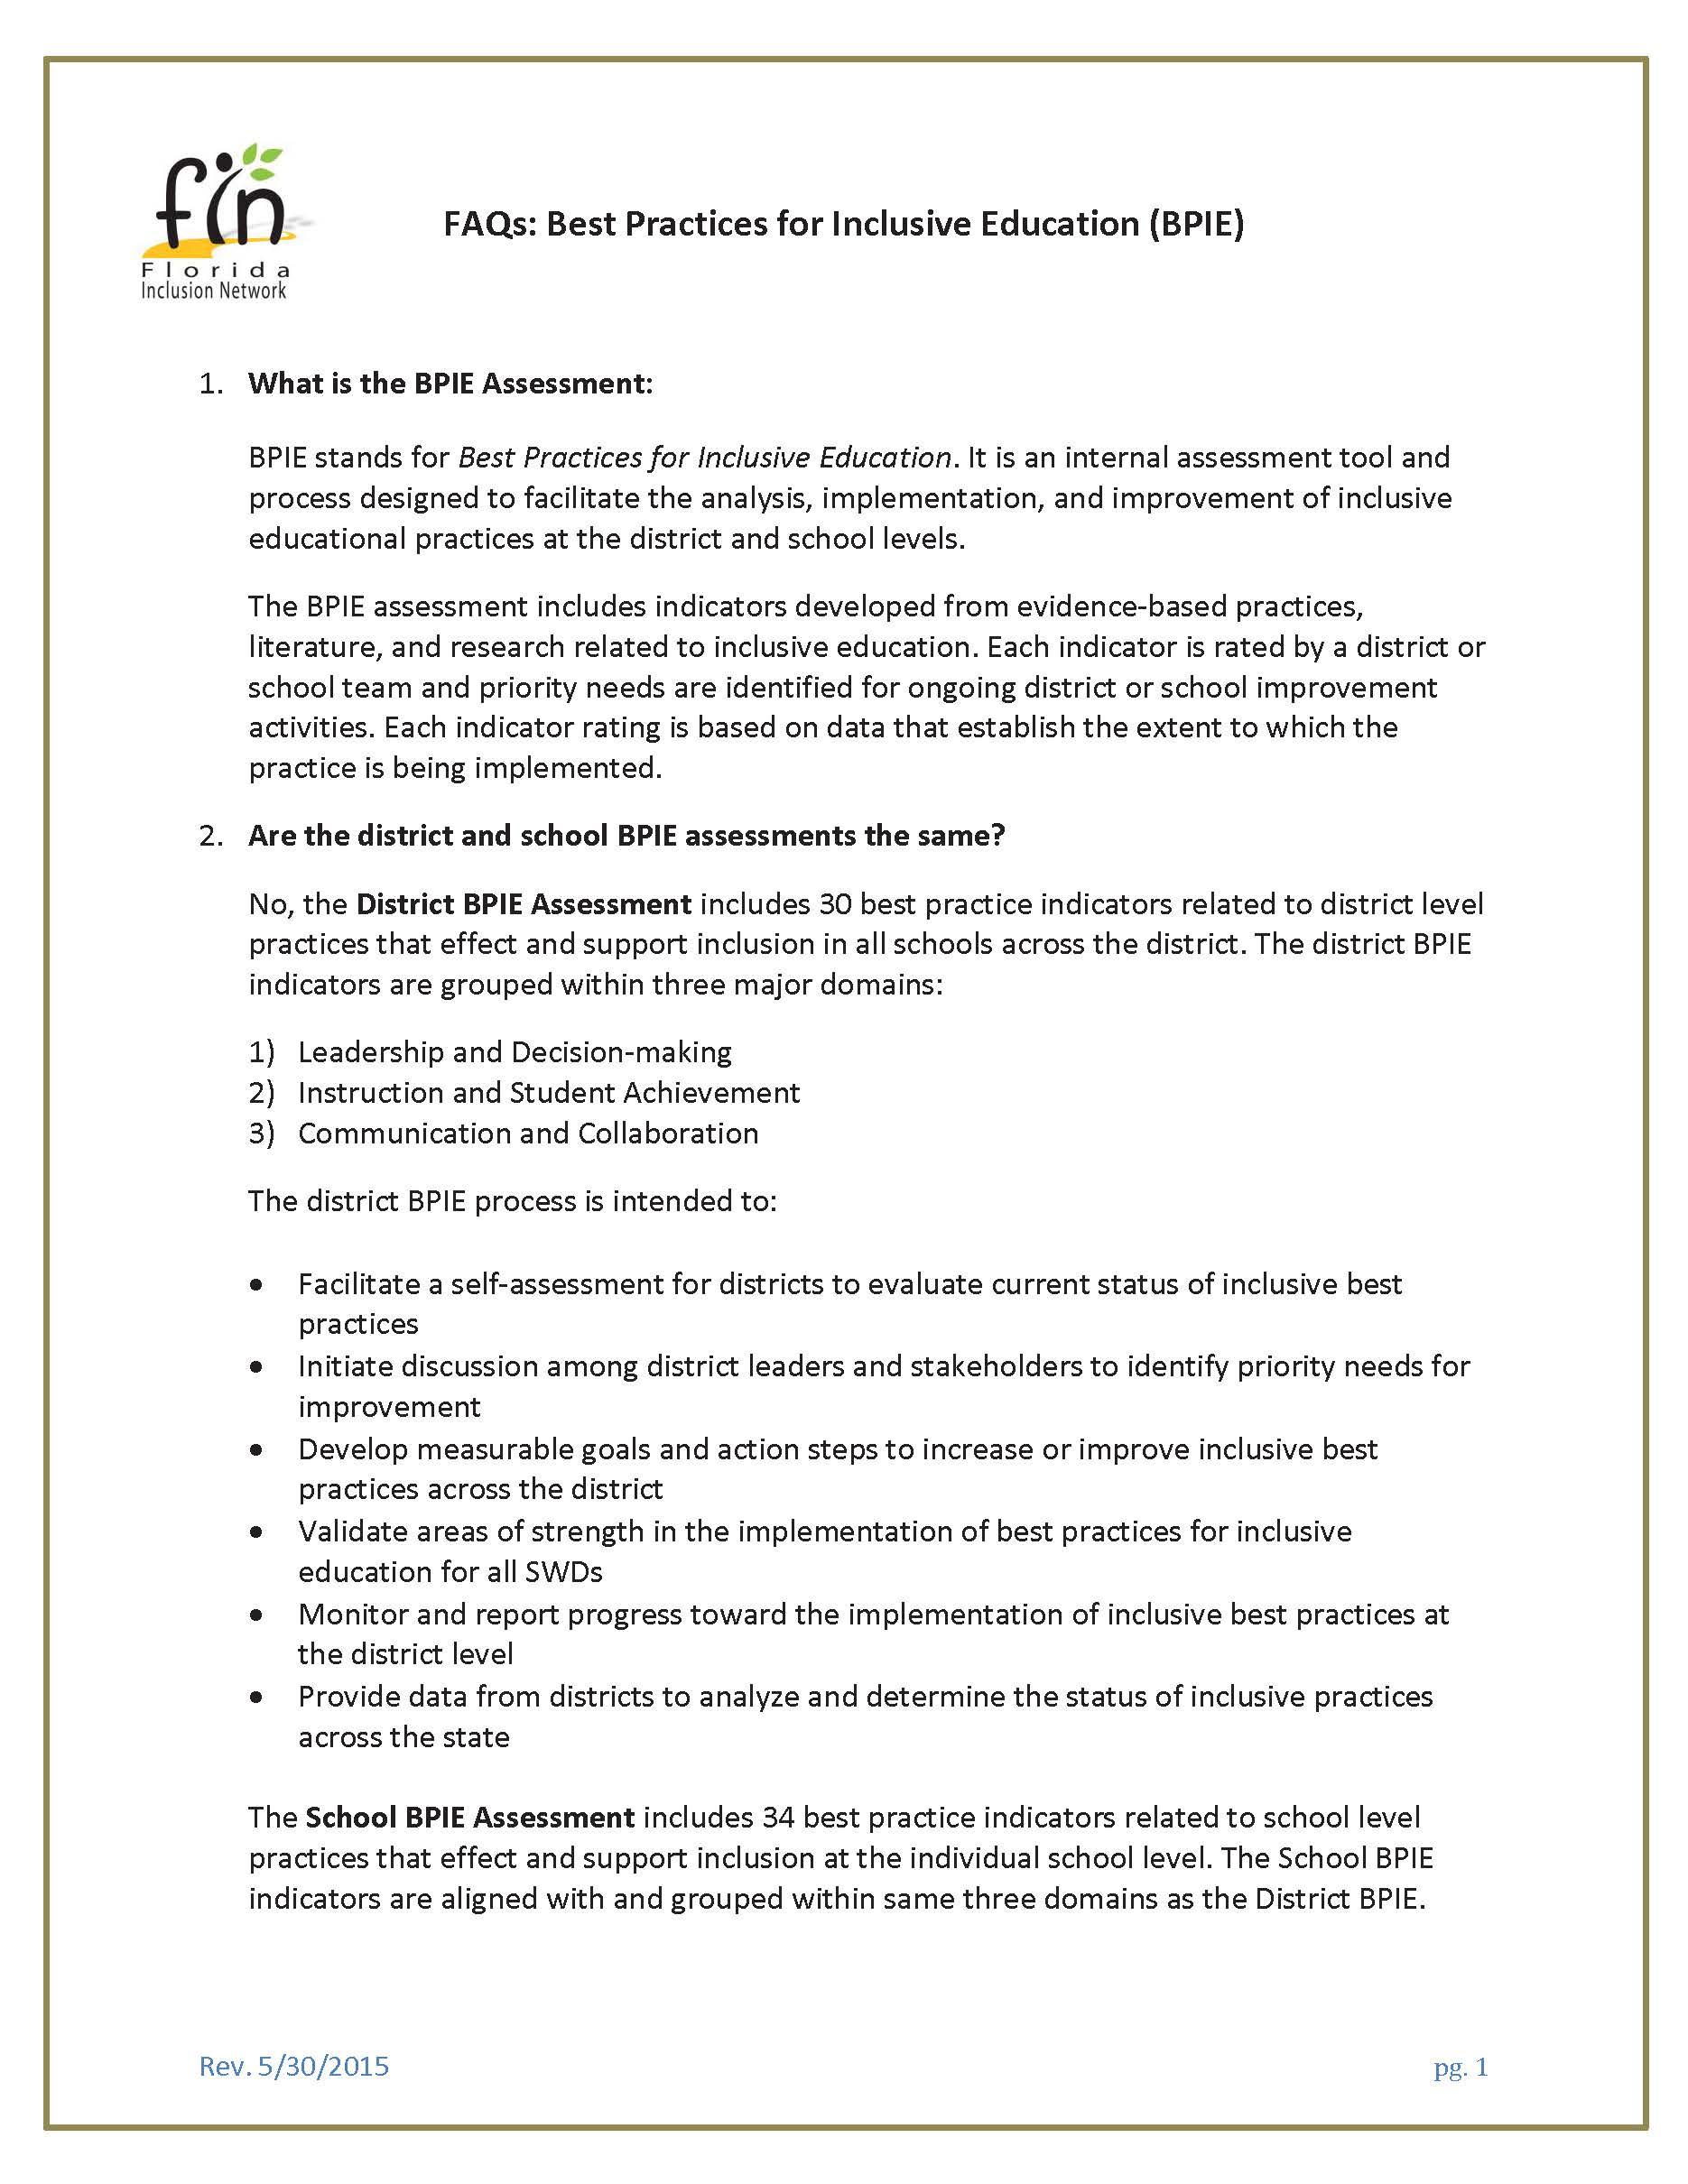 4-School BPIE FAQs page 1